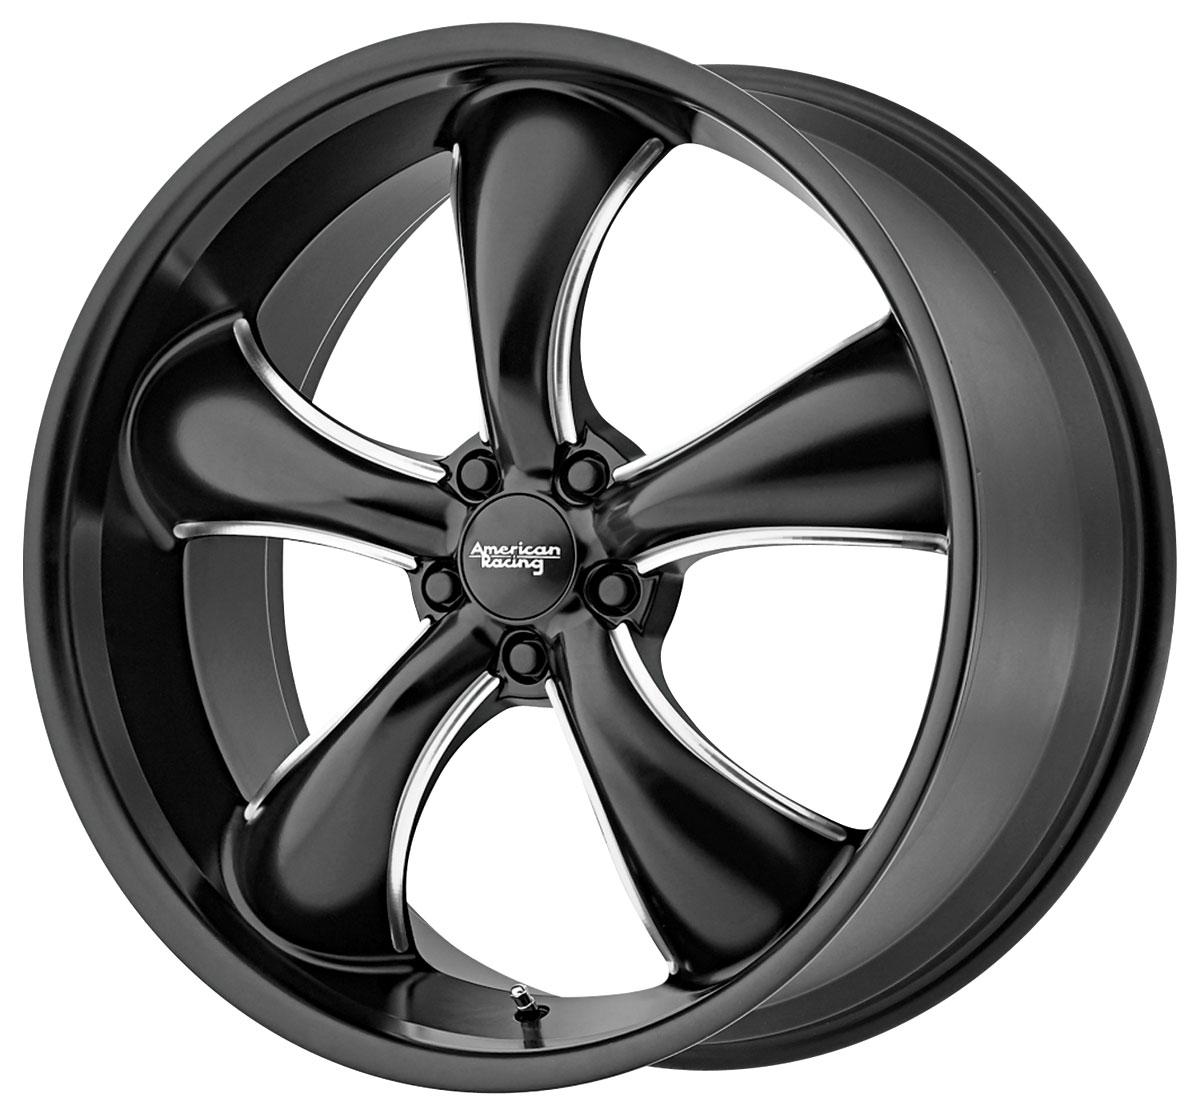 Wheel, American Racing, TT60, 2016-19 CTS/CTS-V, 22x9